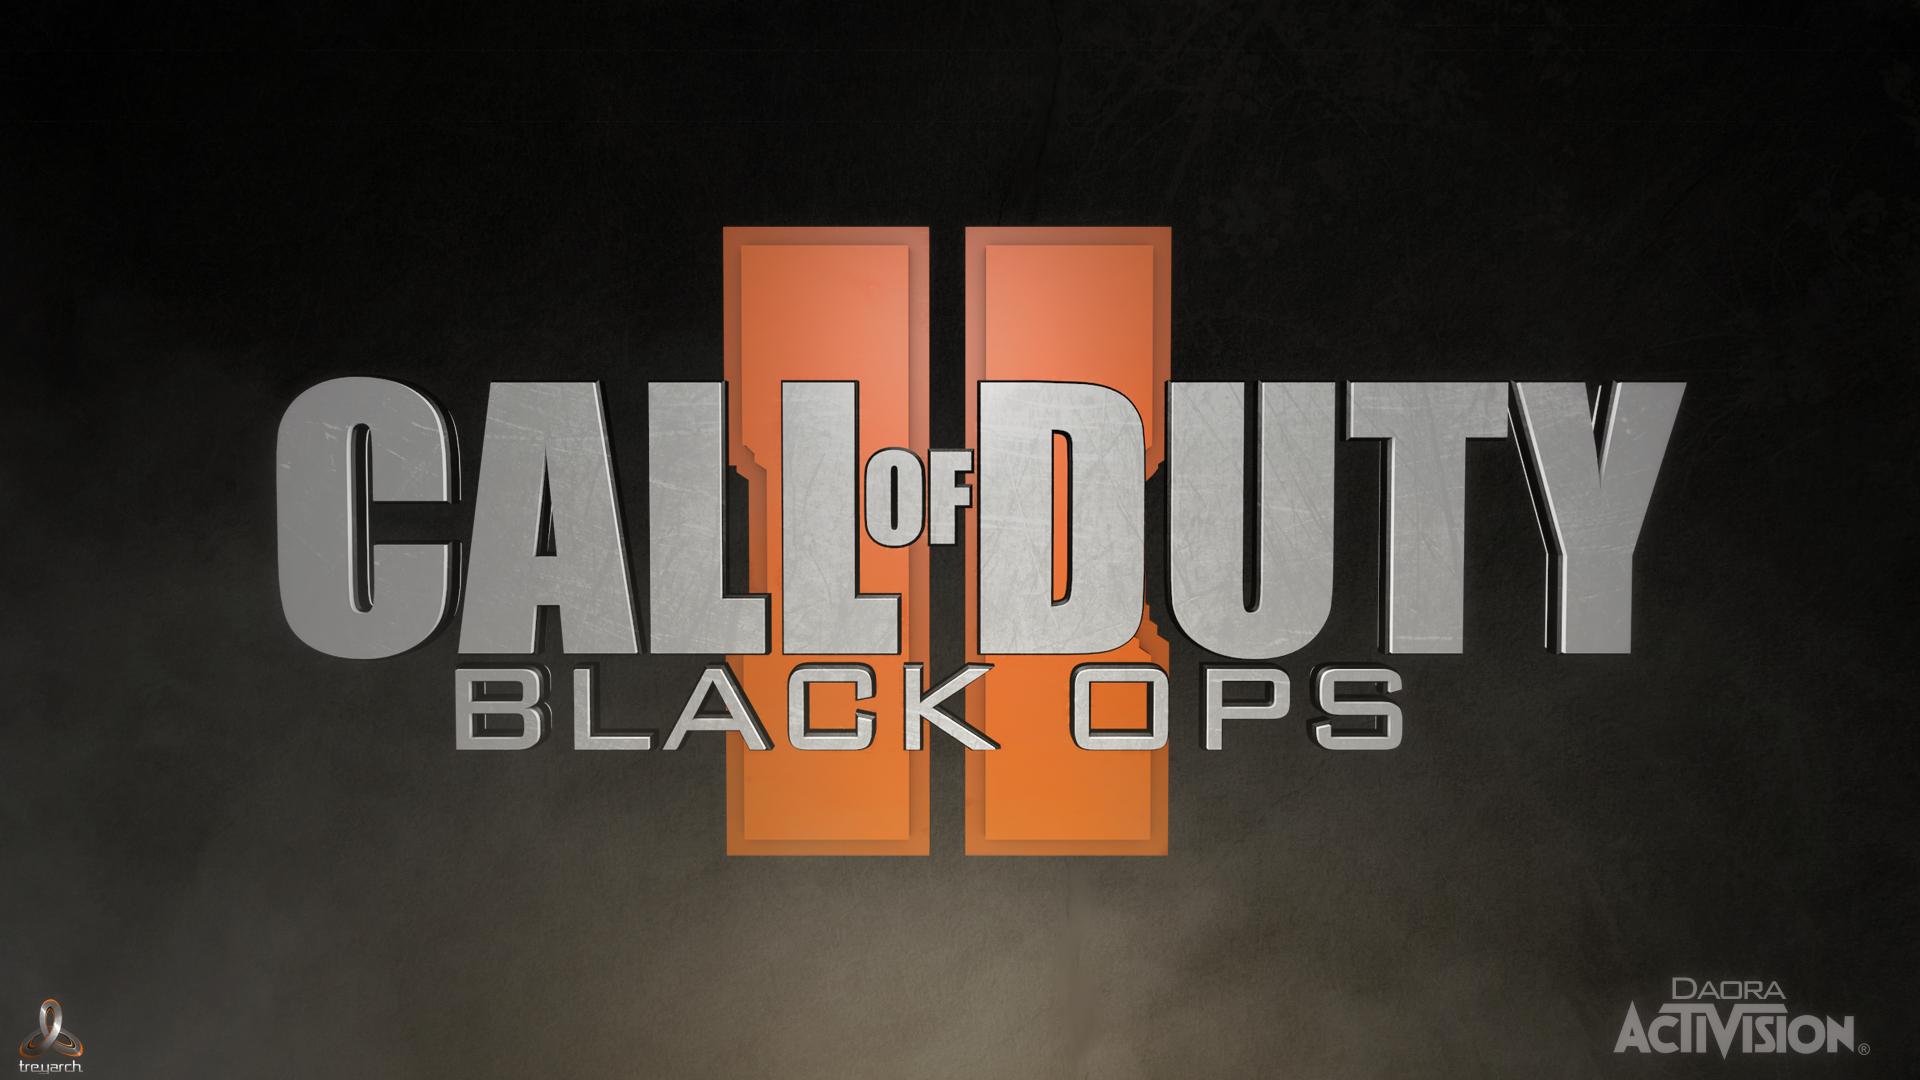 Call Of Duty Black Ops 2 Wallpaper By Daora1 On Deviantart